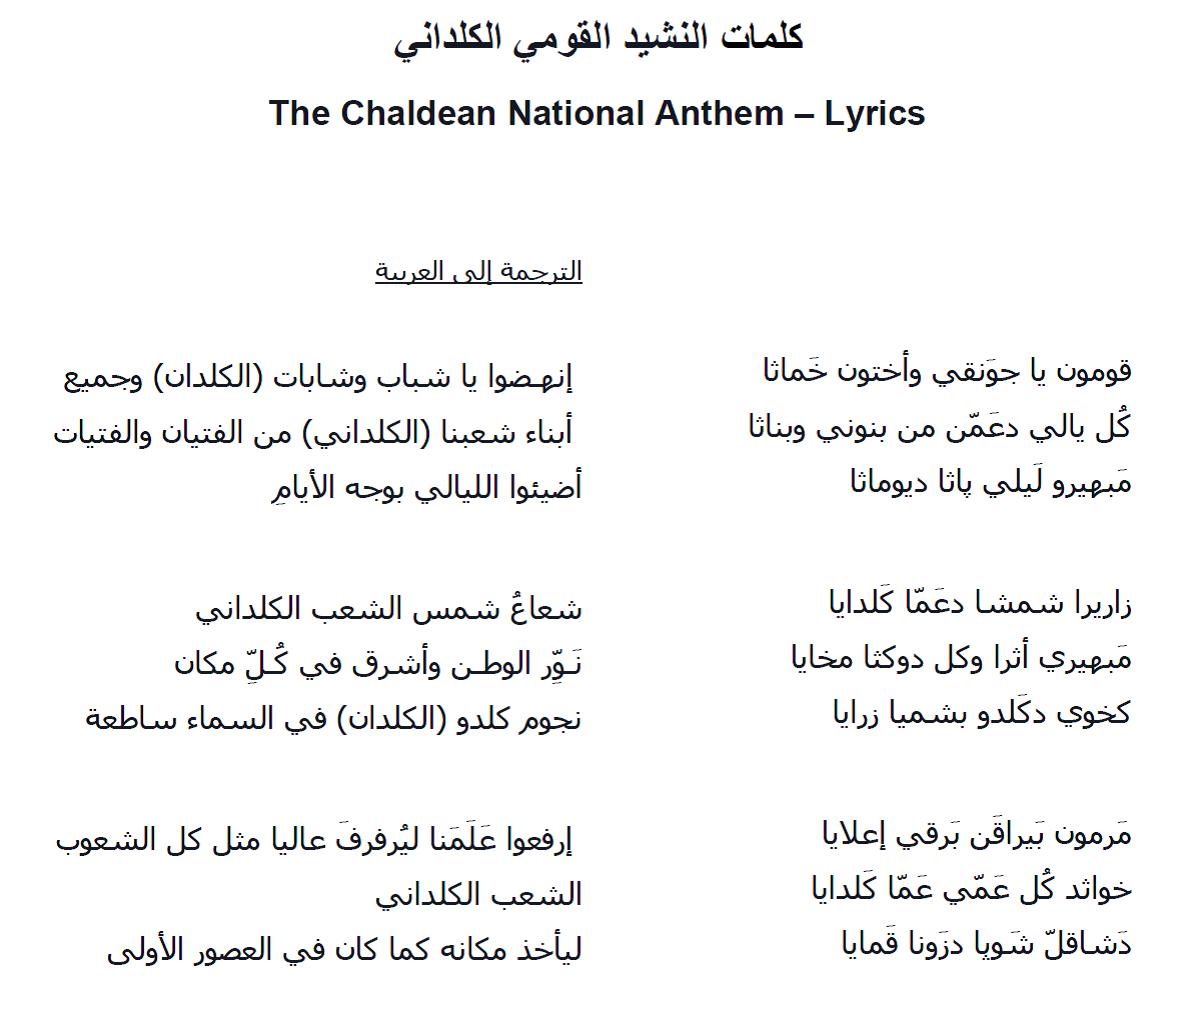 Chaldean National Anthem-Lyrics